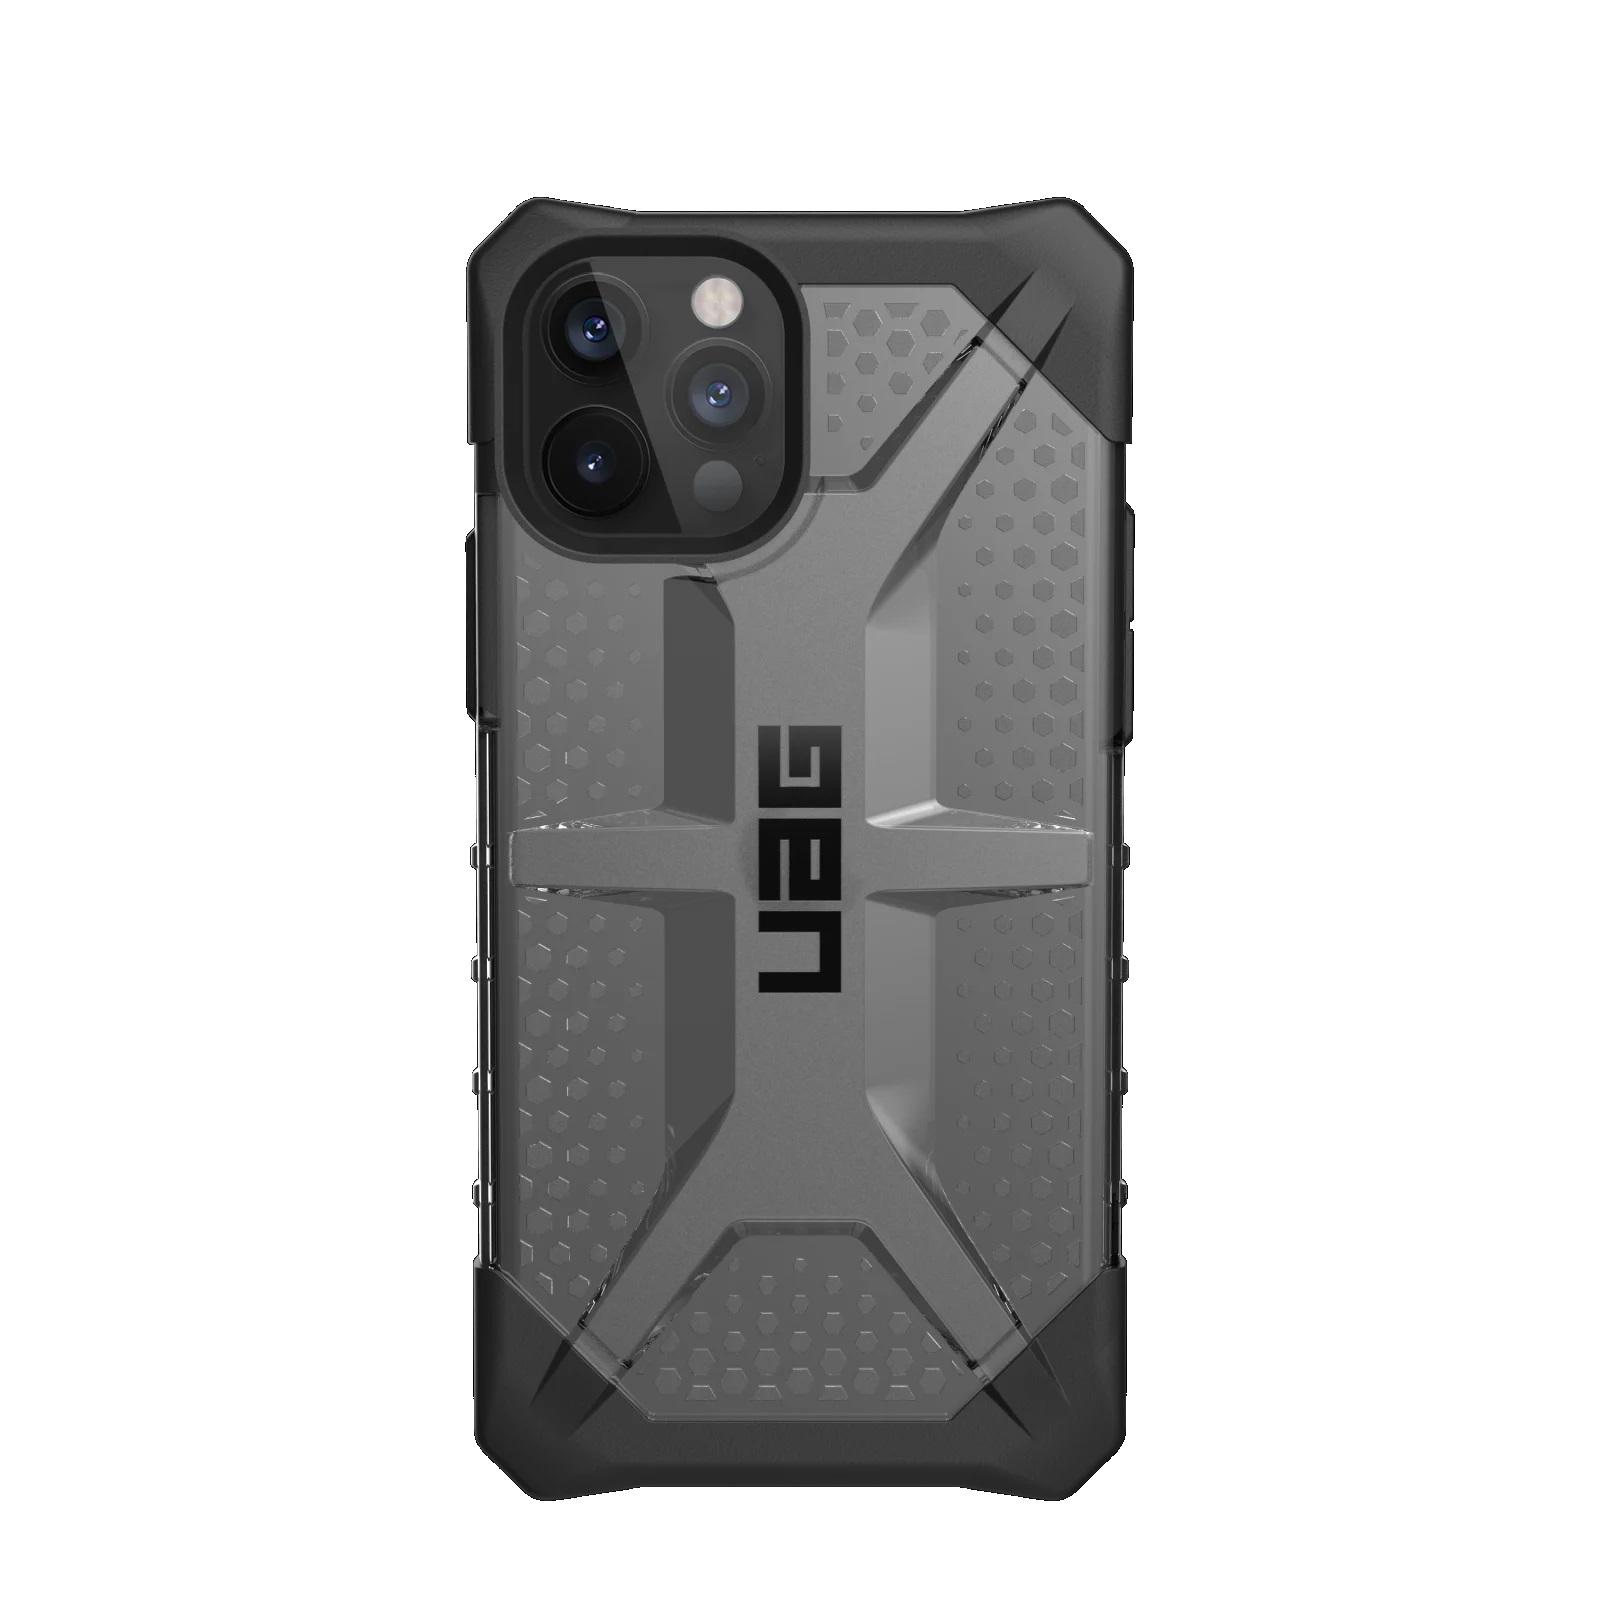 "Urban Armor Gear APPLE MILLENIUM 2 PLASMA ICE ACCS funda para teléfono móvil 17 cm (6.7"") Negro, Gris, Transparente"